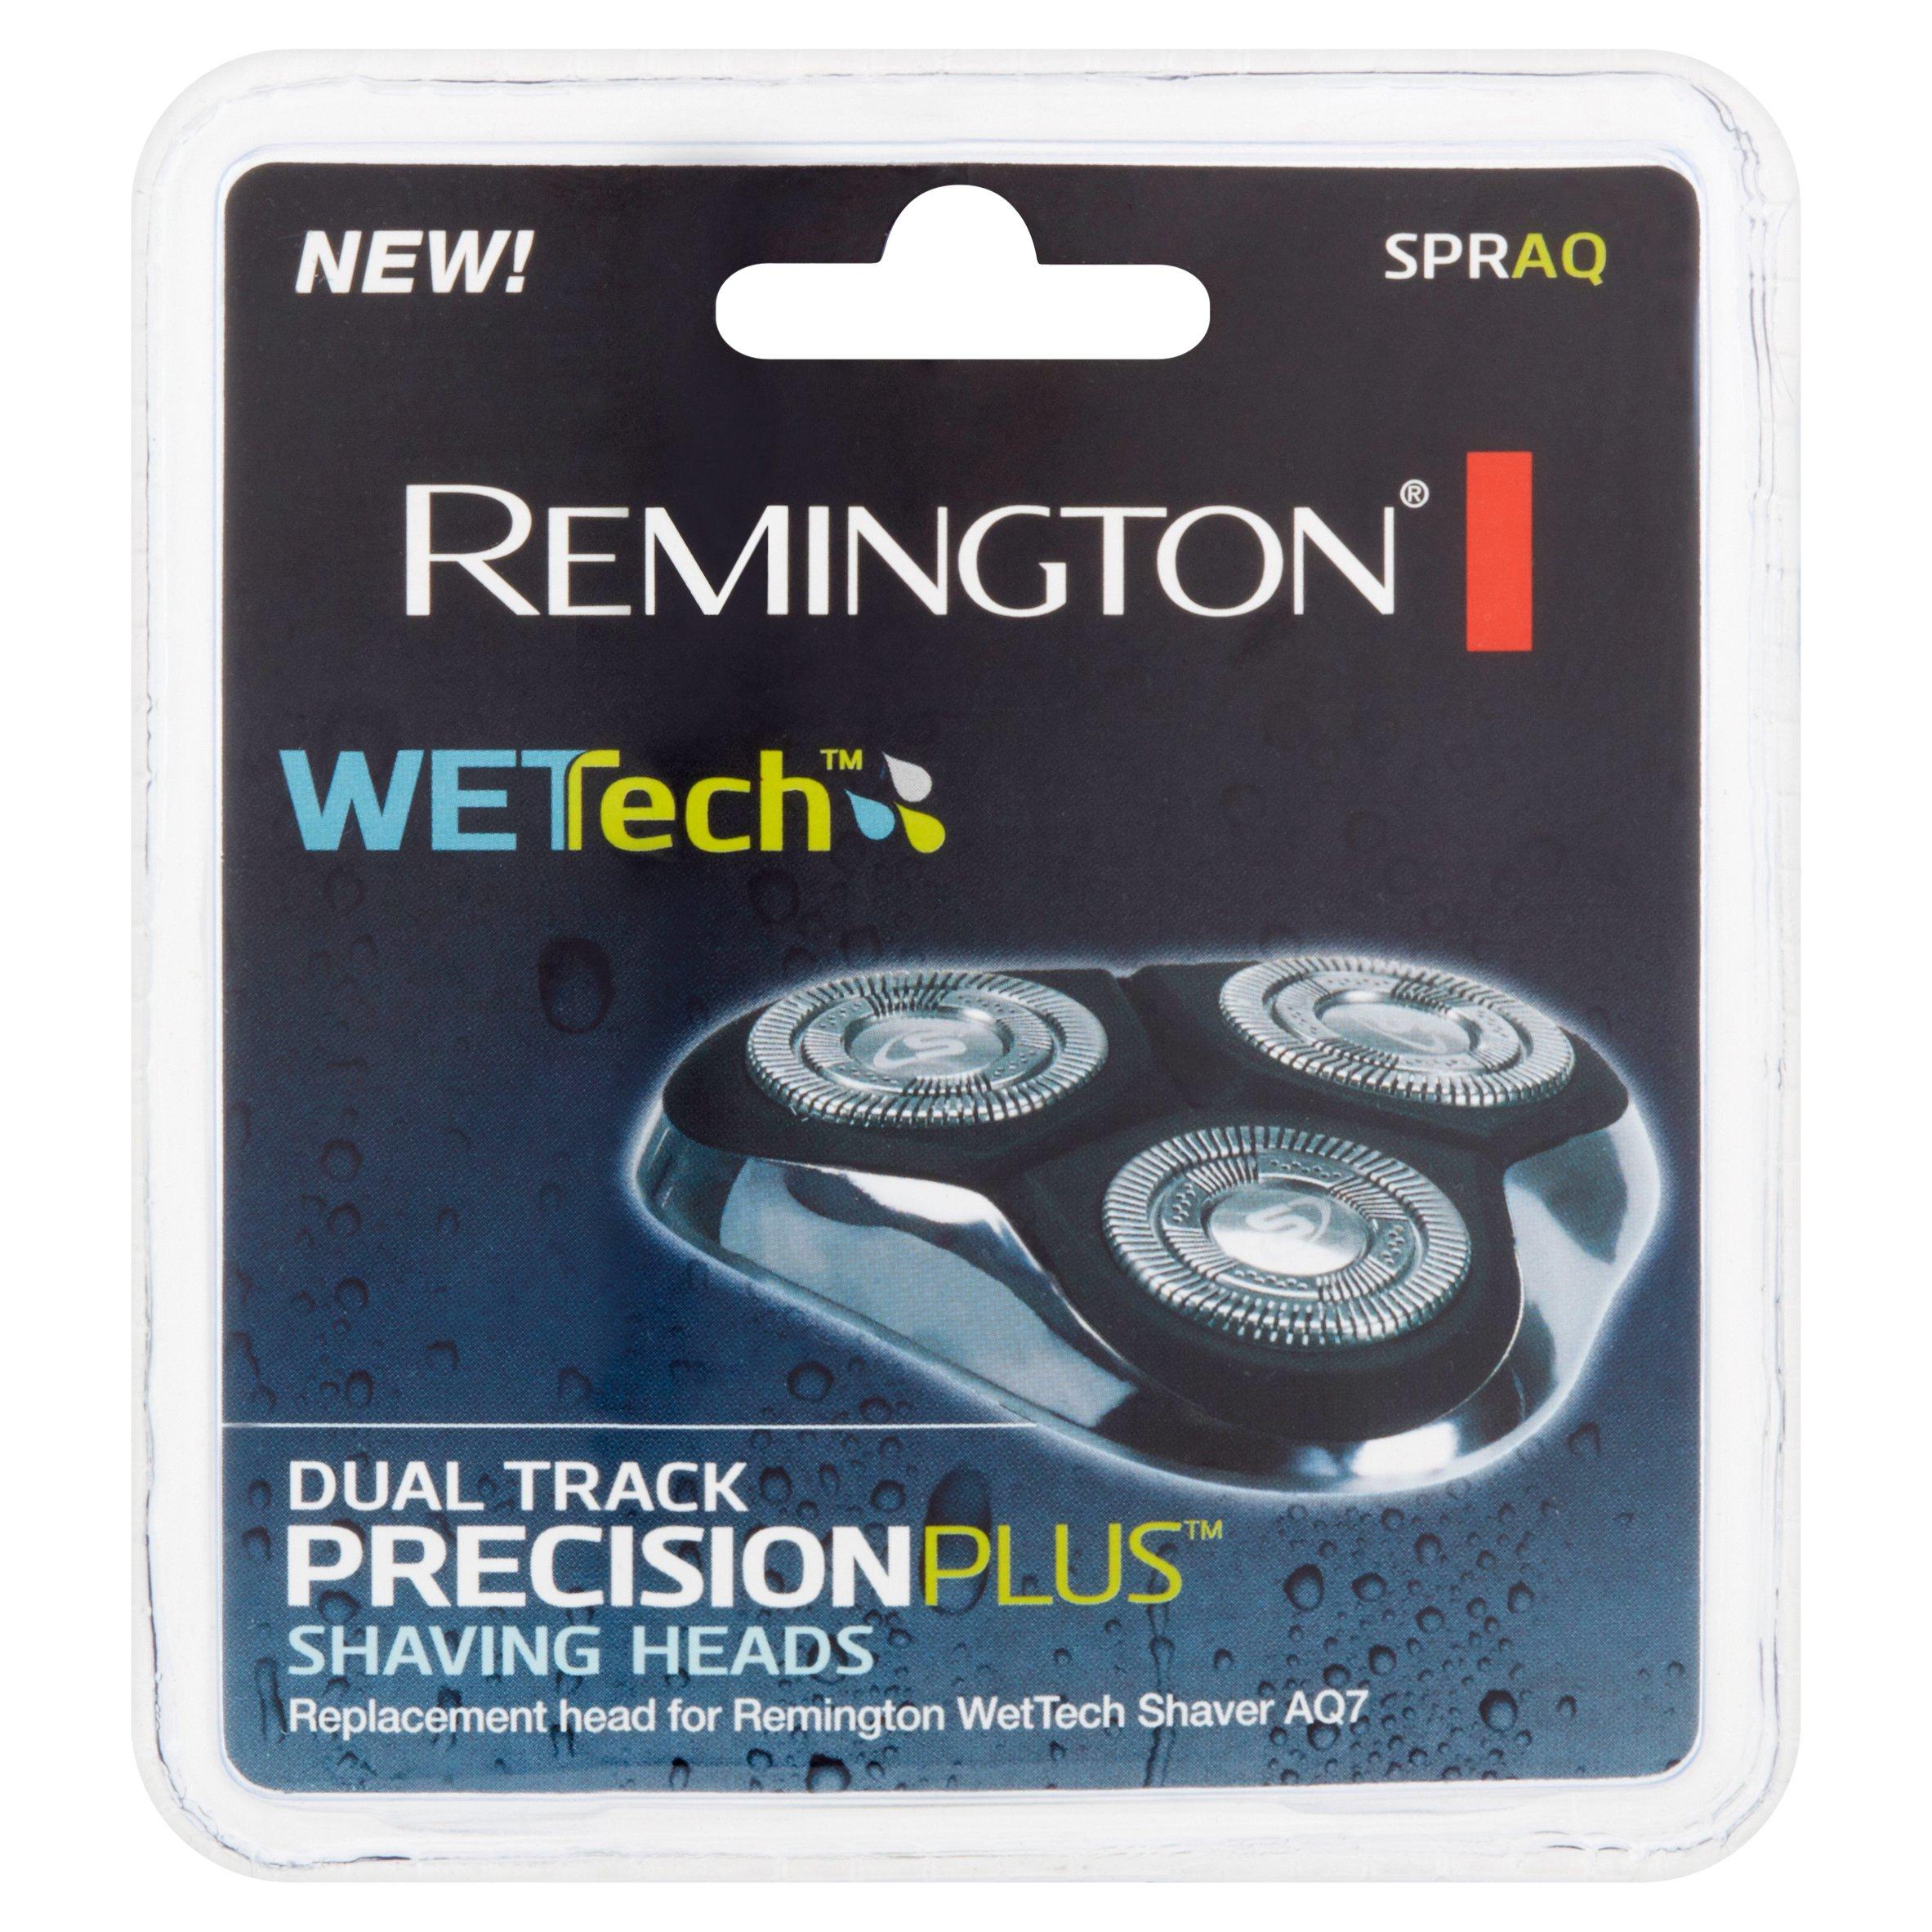 Remington WetTech PrecisionPlus Dual Track Spraq Shaving Heads